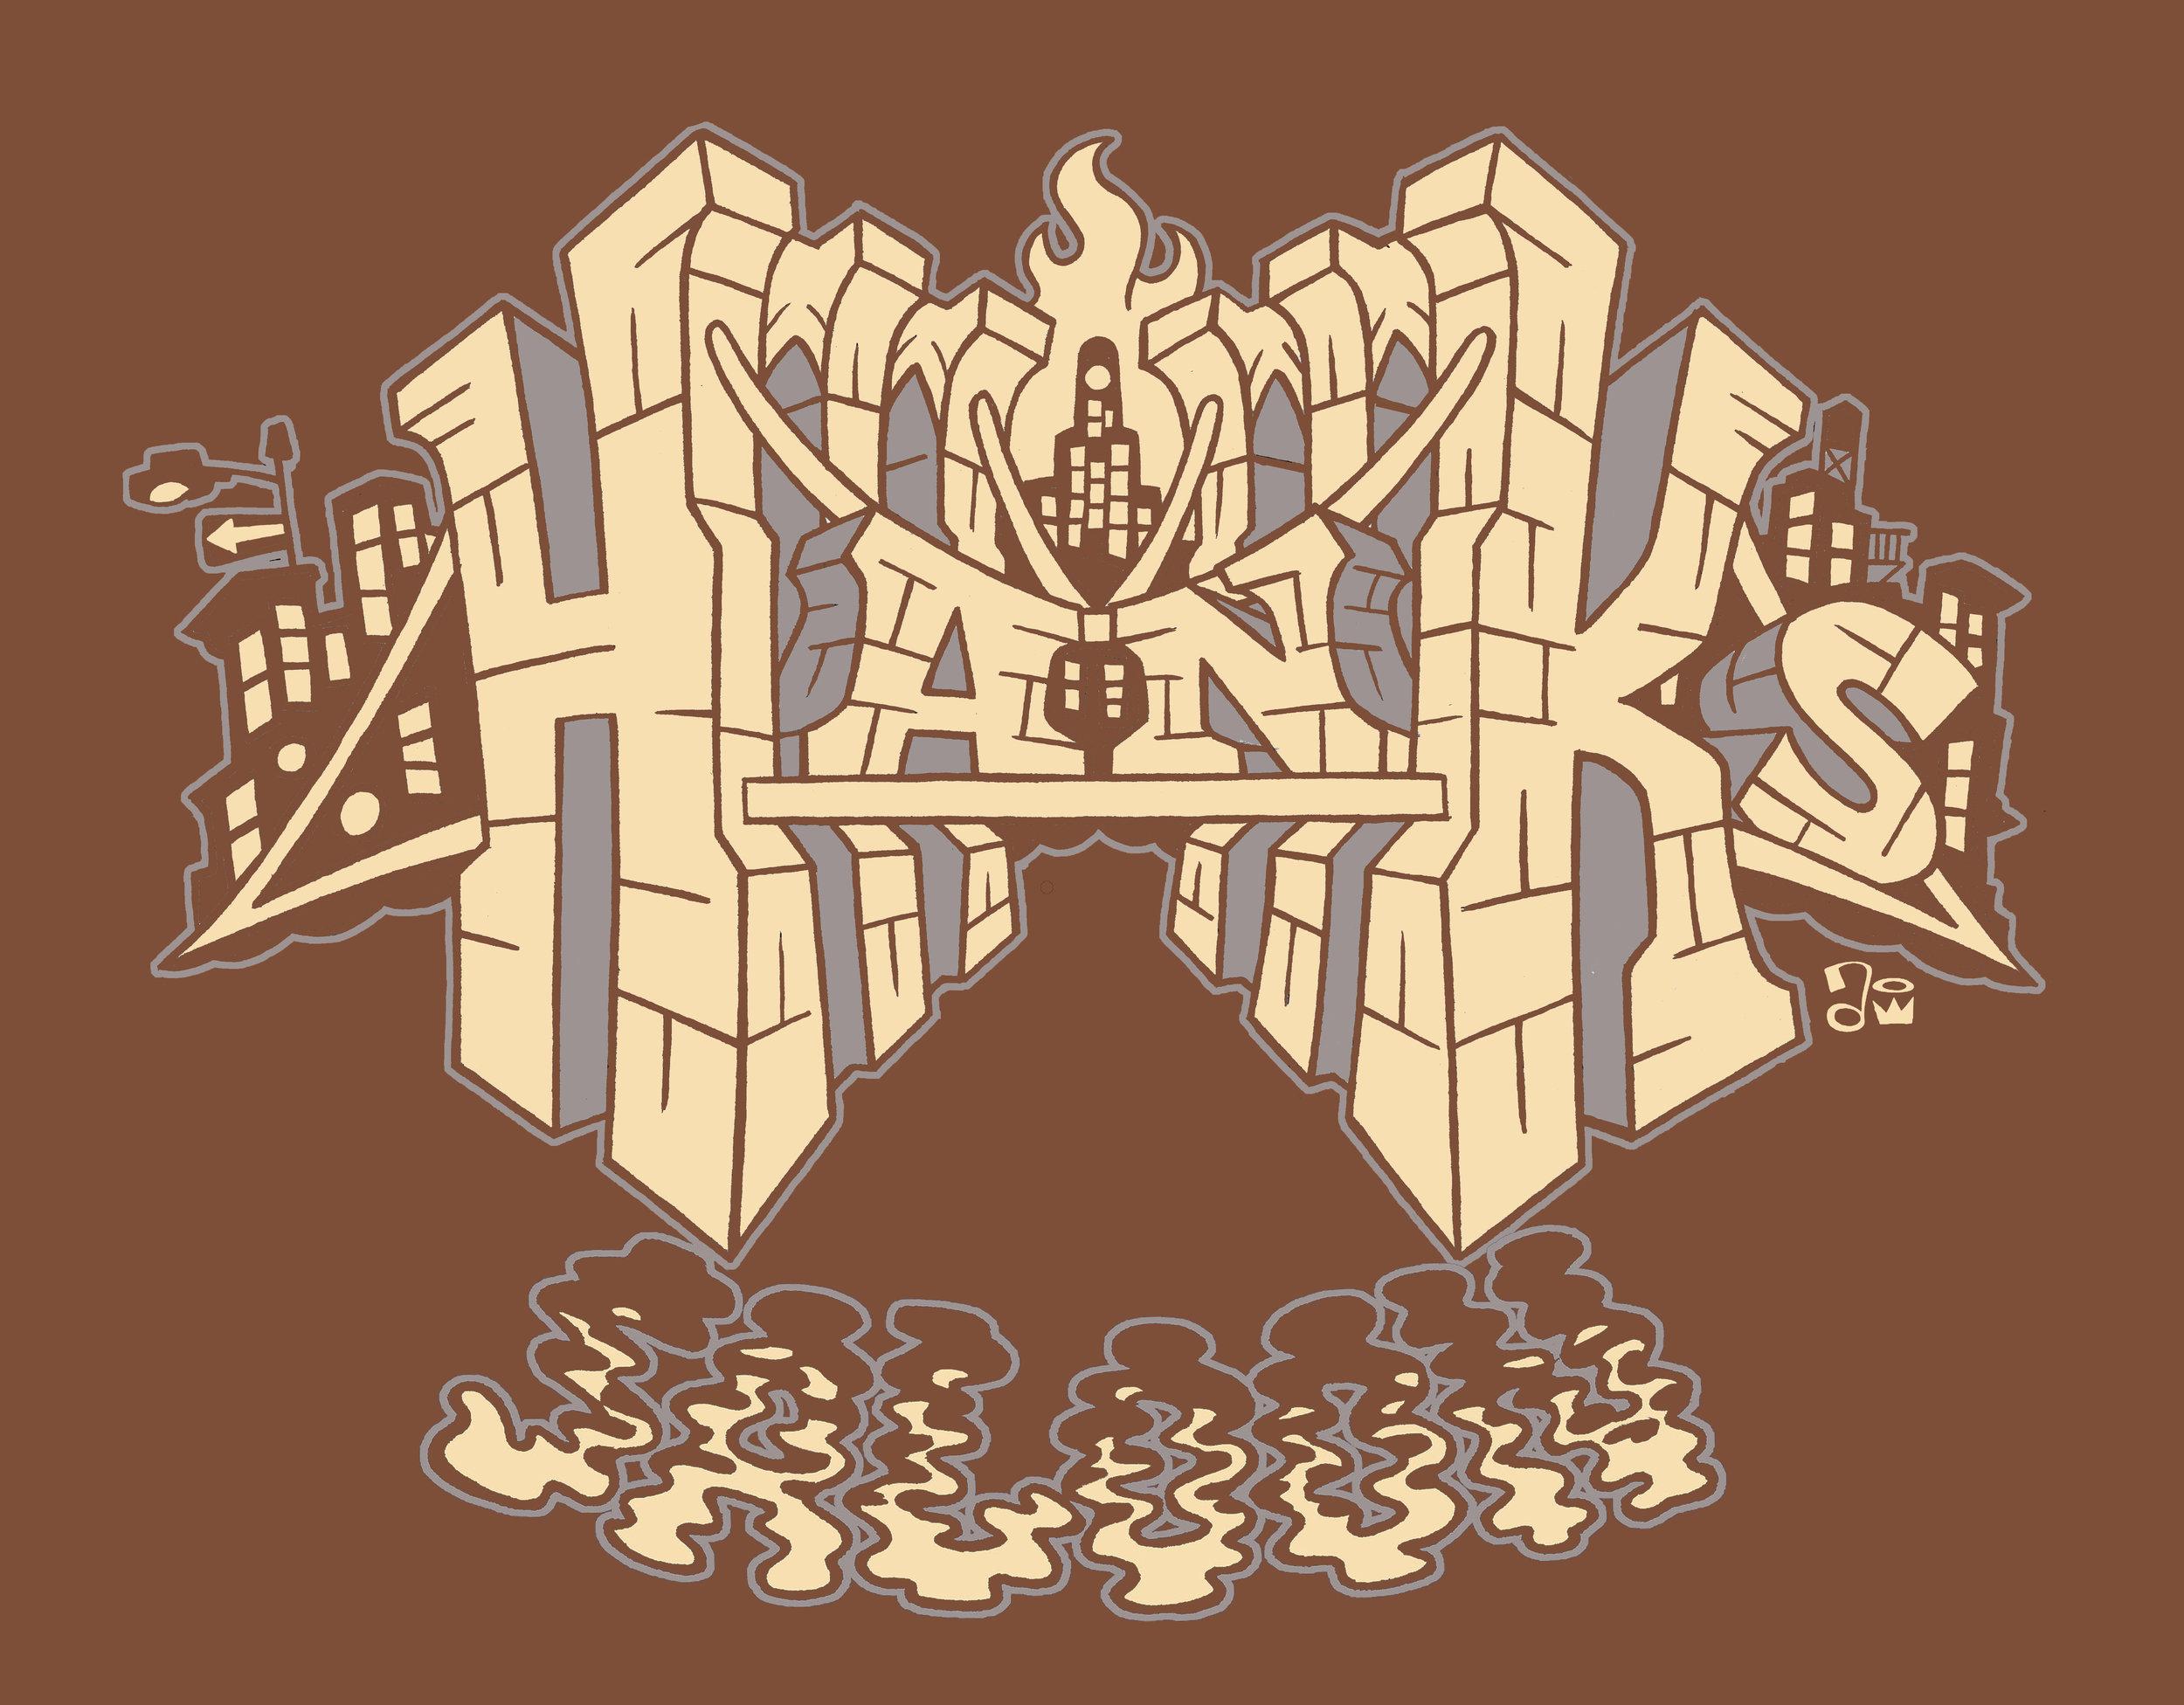 Hank's Saloon Tshirt Design.jpg